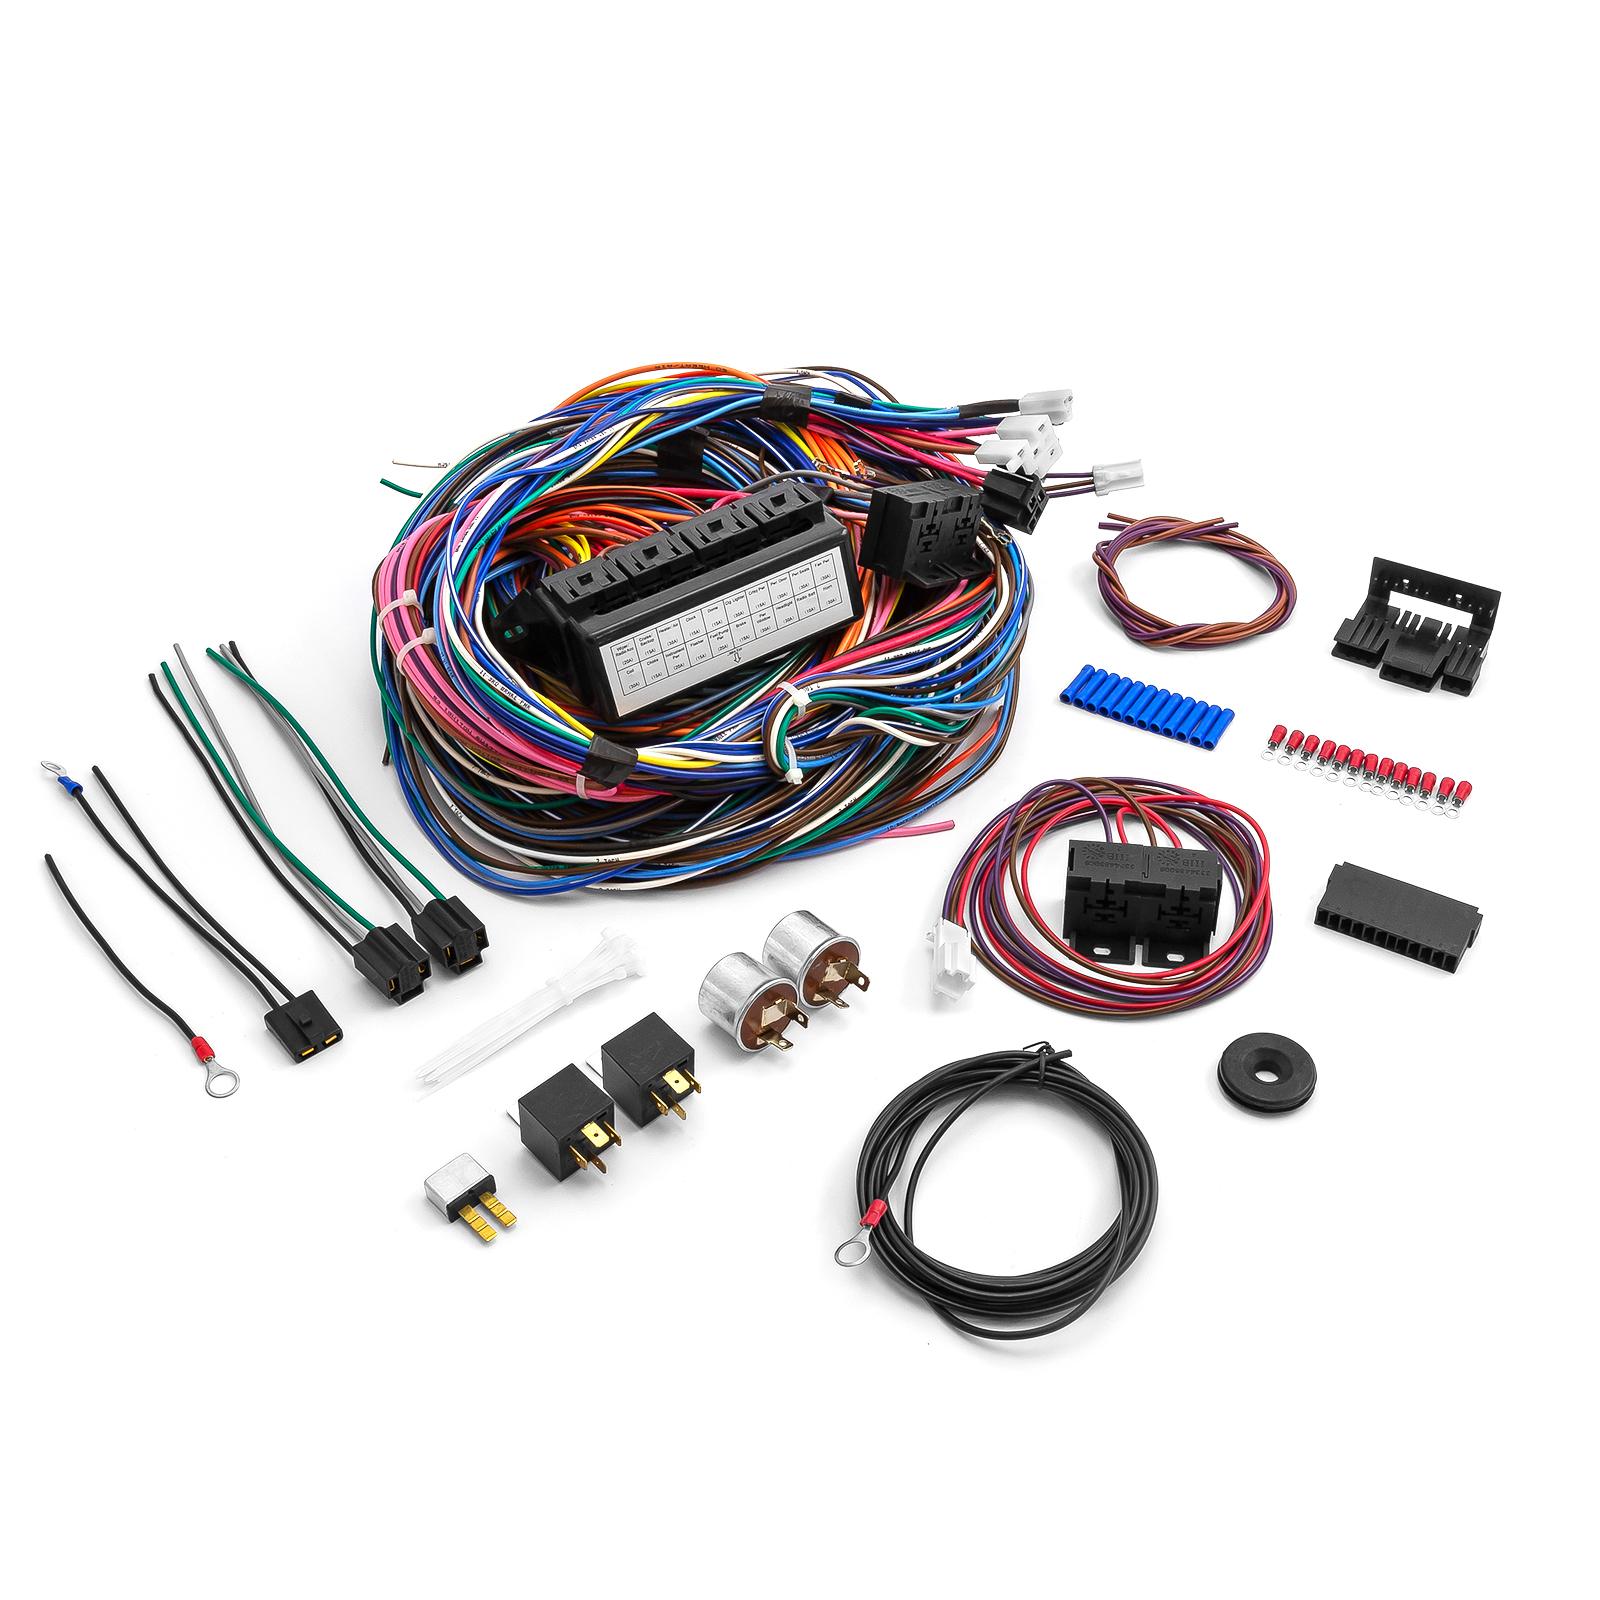 Universal 20 Circuit Wiring Harness Kit Street Rod Hot Rod Race Car